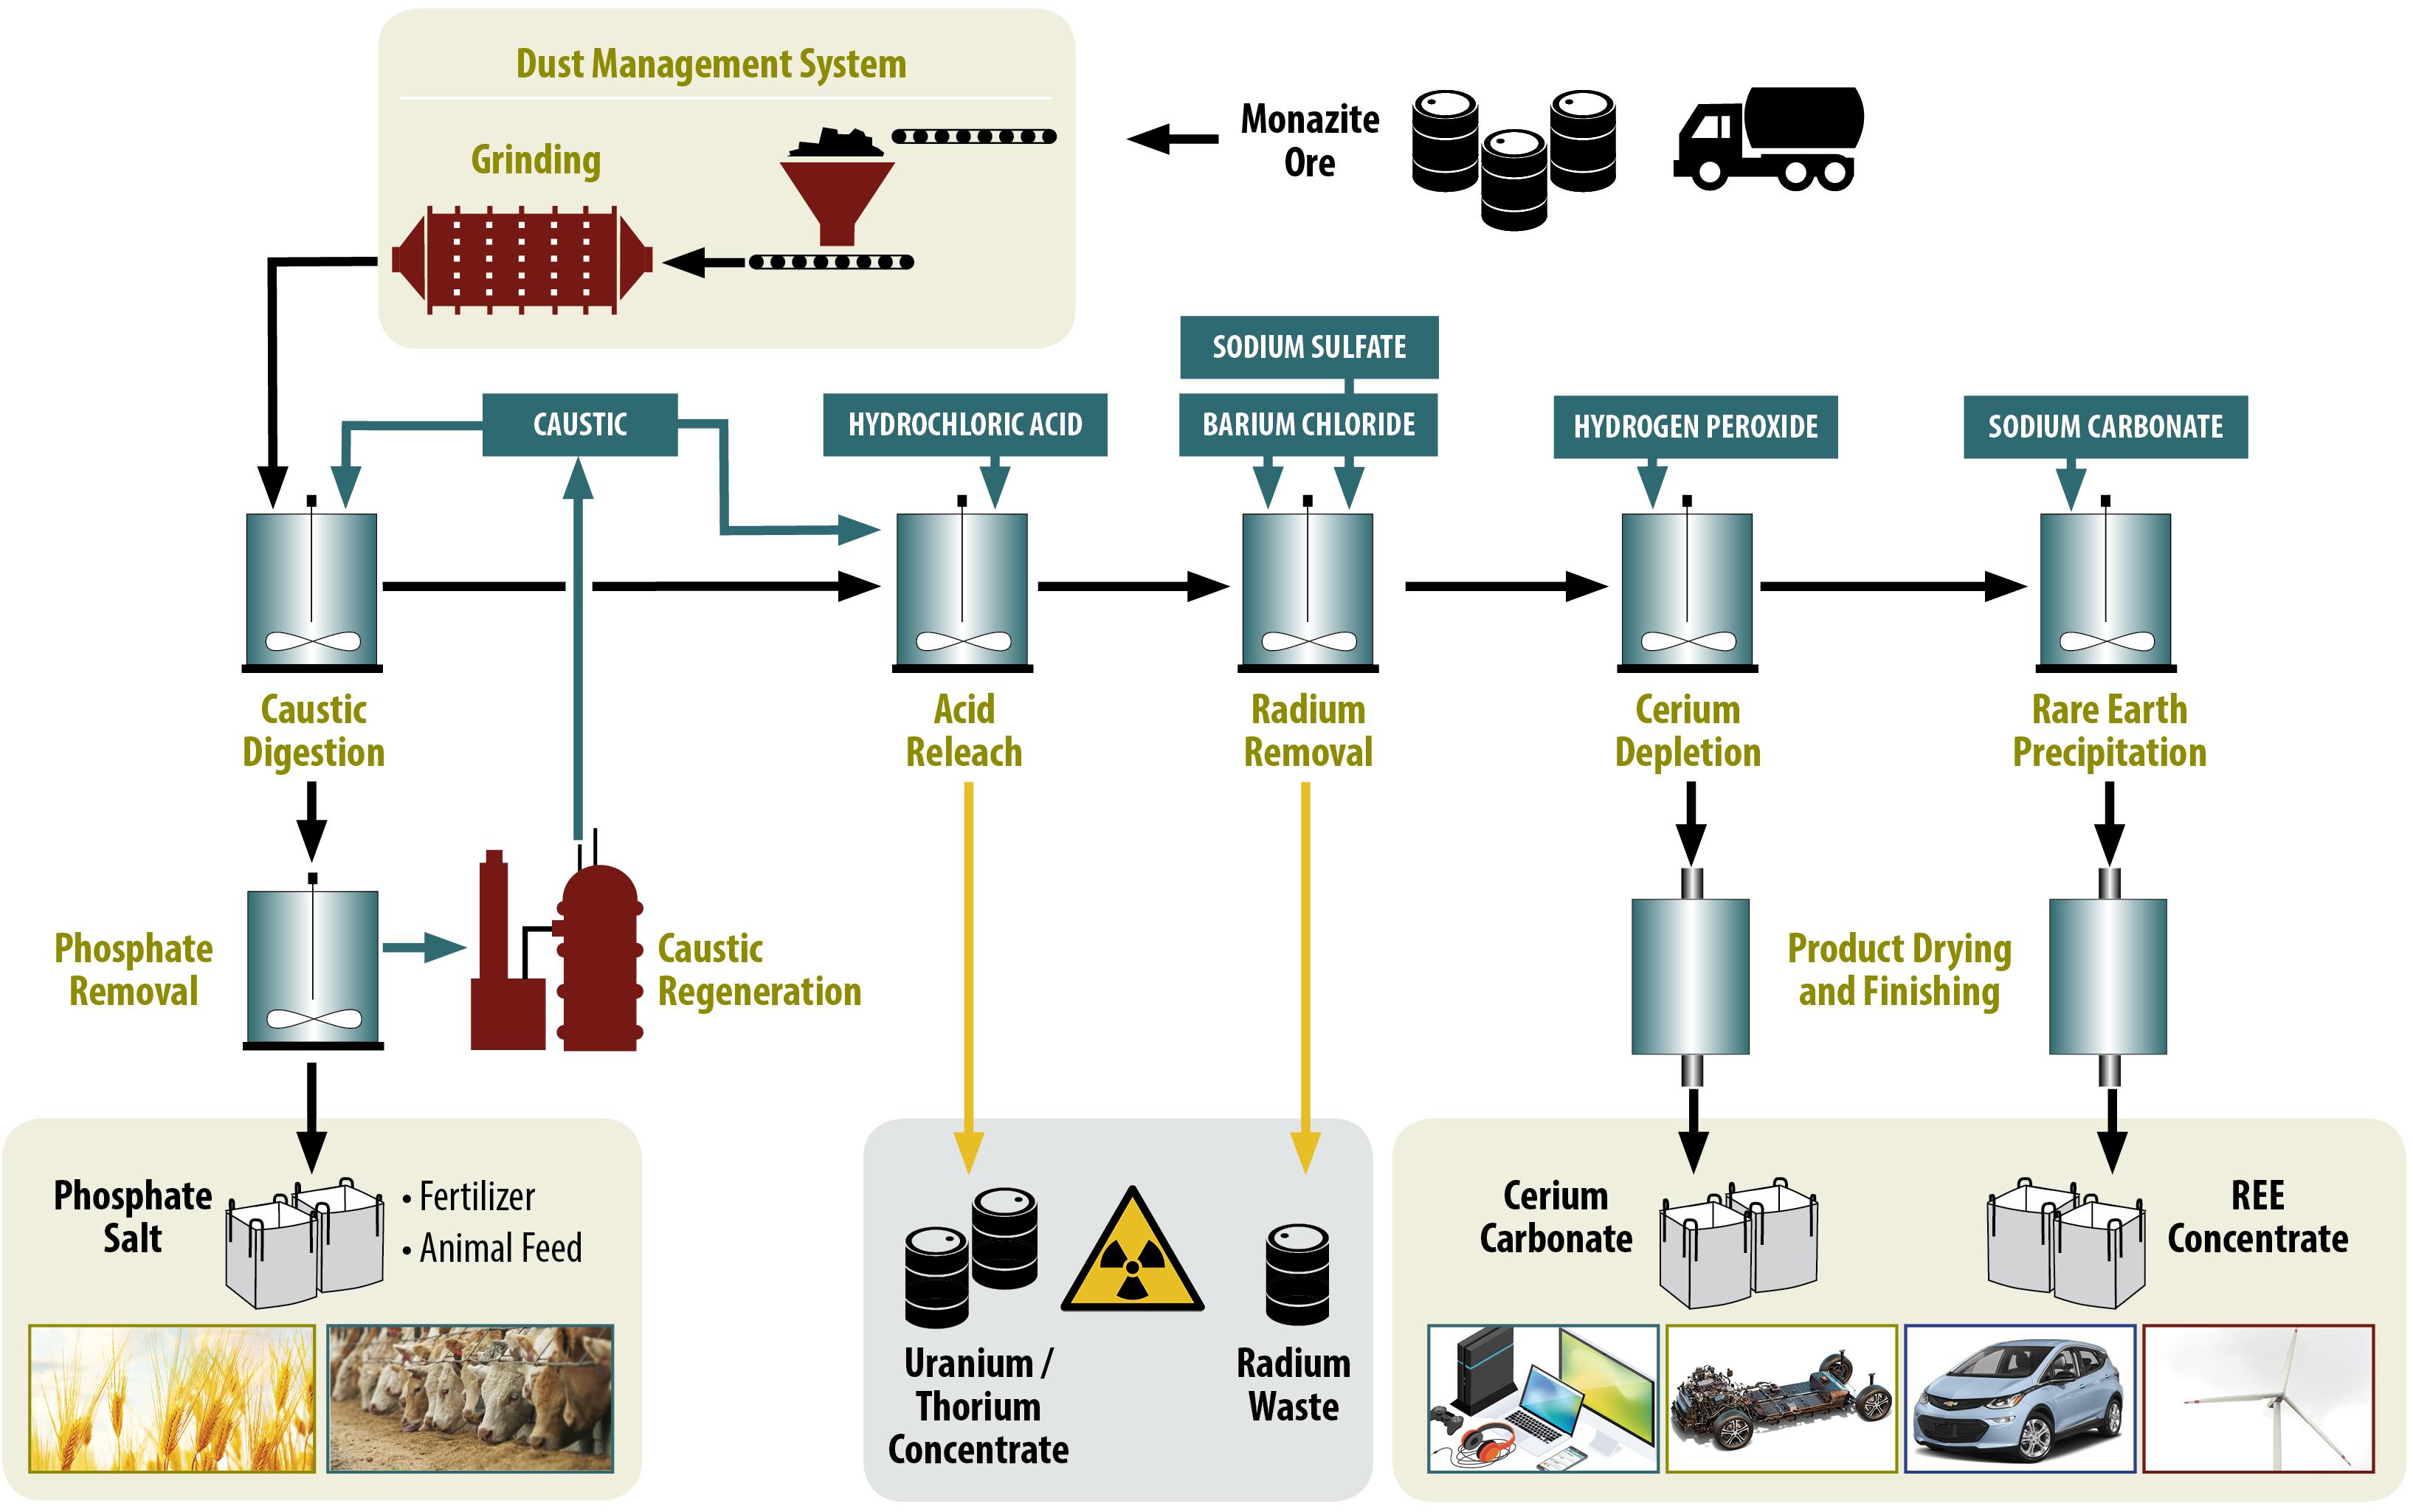 medium resolution of medallion top level process flow diagram